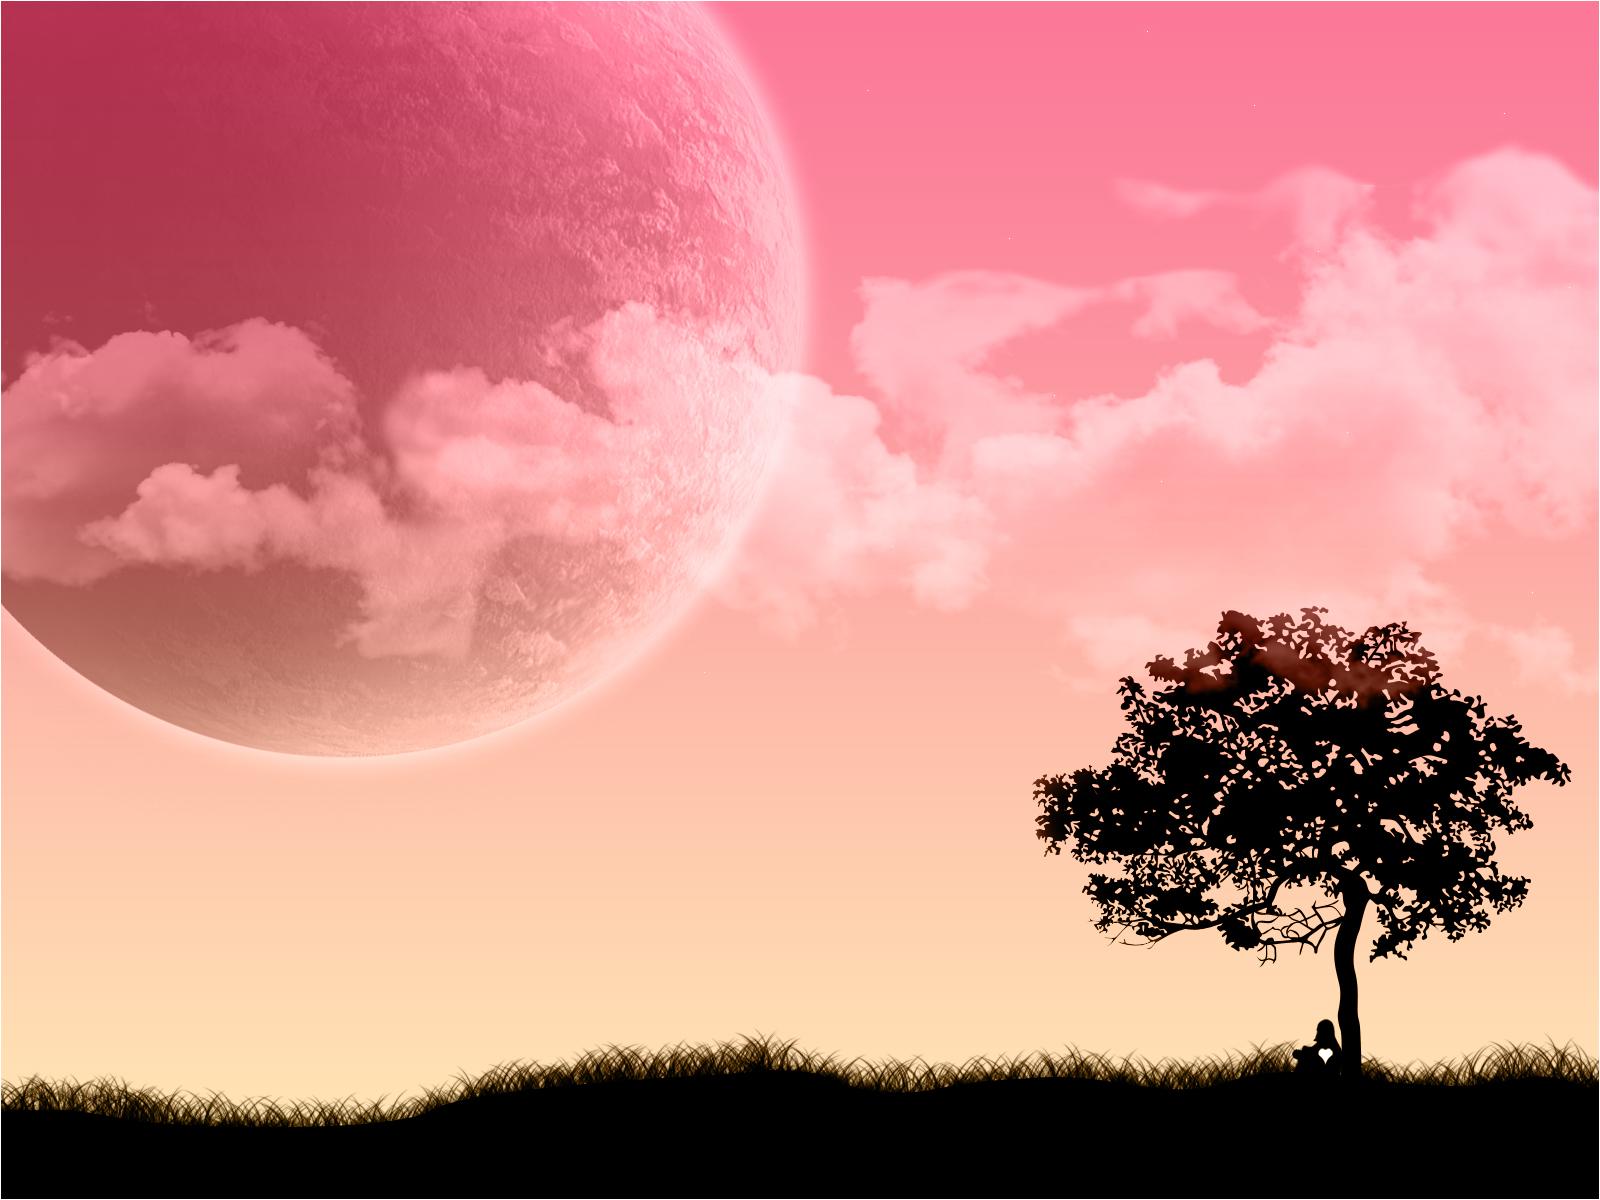 Pink And Black Wallpaper   HD Desktop Wallpapers 1600x1200